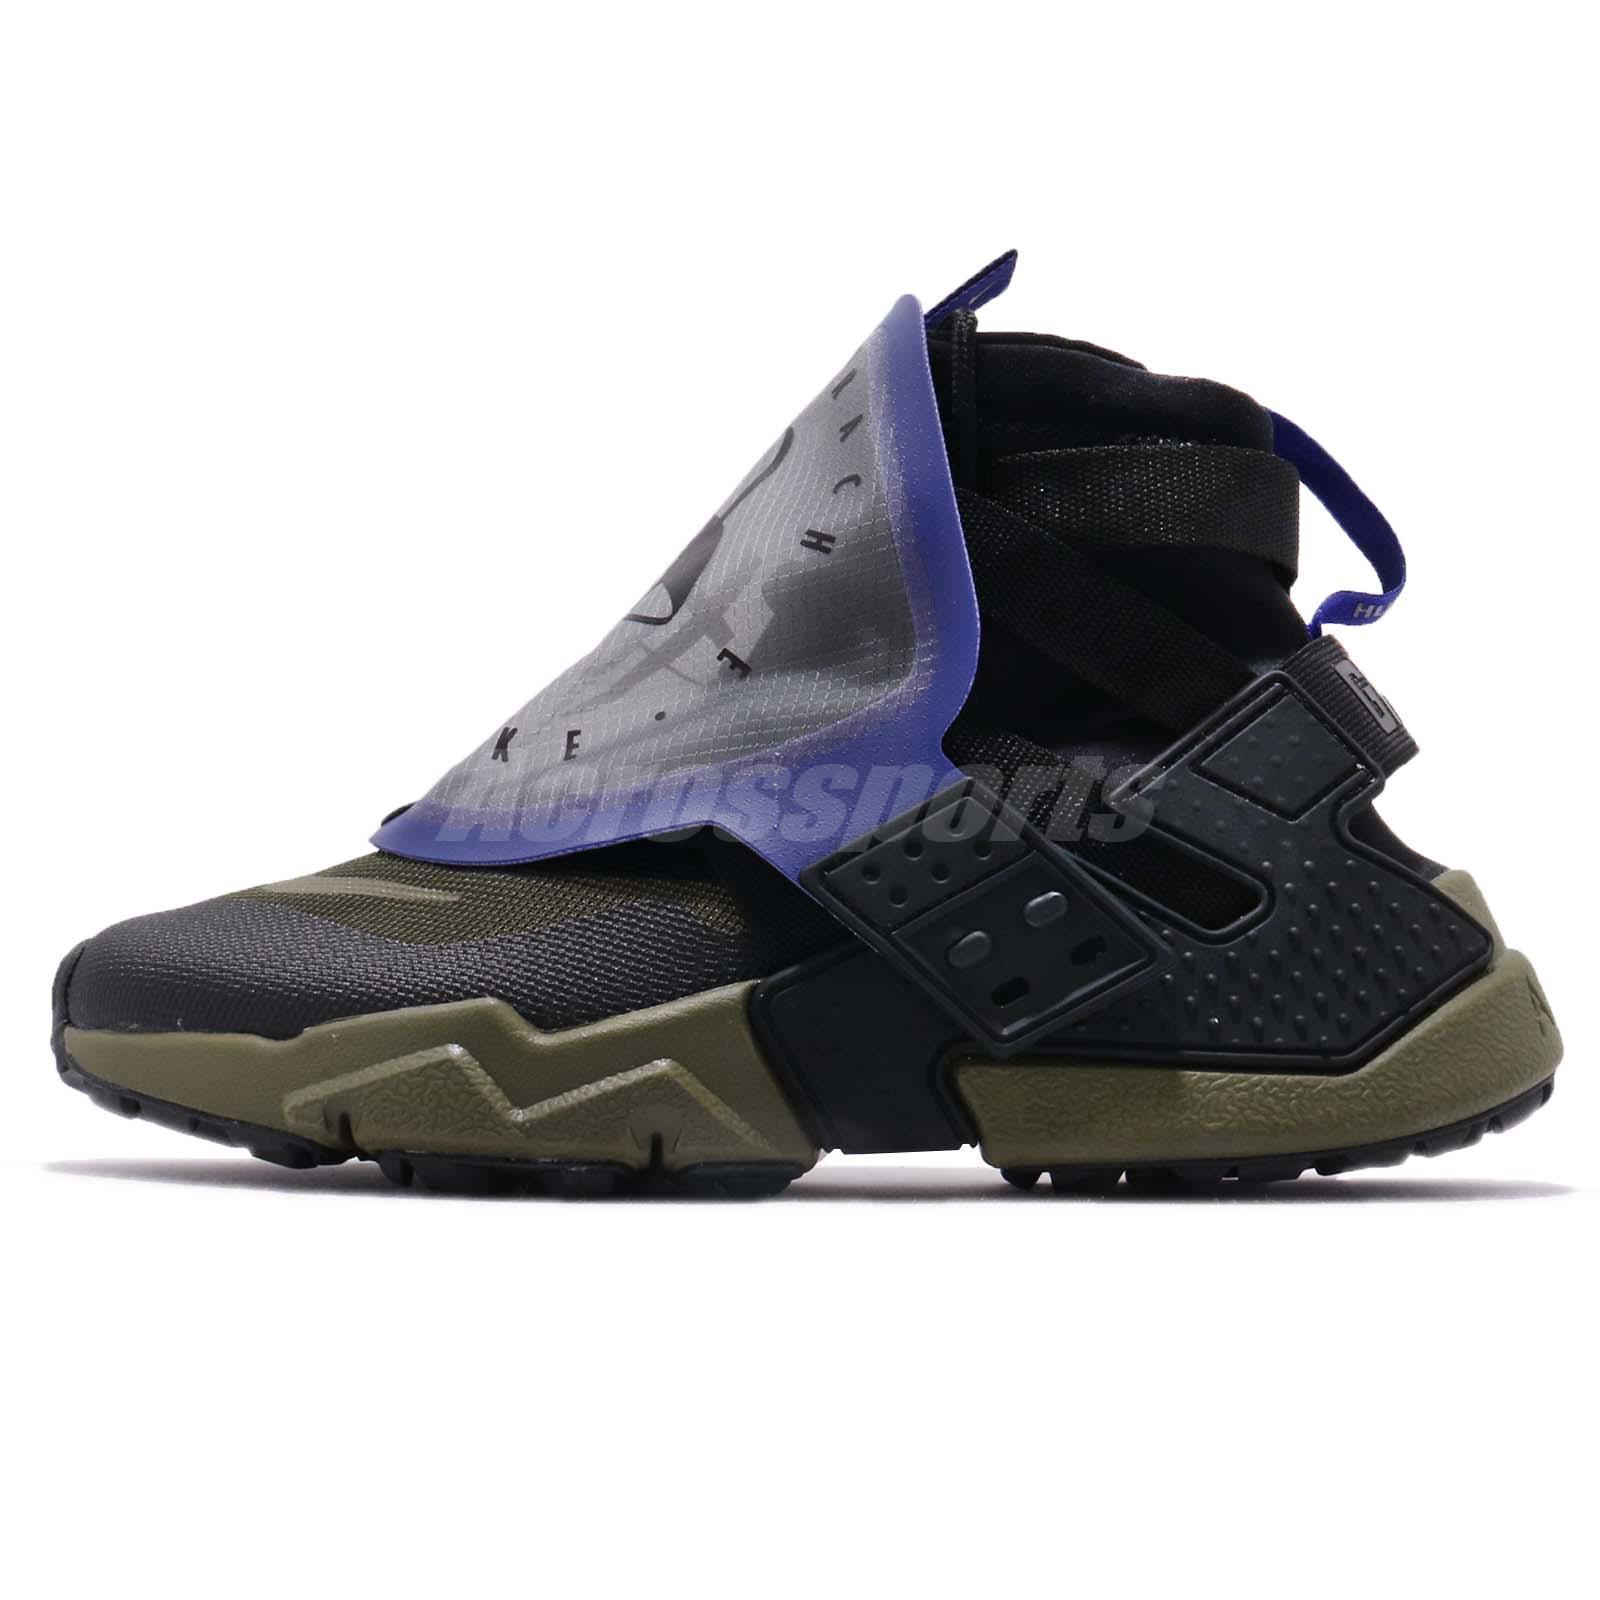 a2d2326fee35 Nike Air Huarache Gripp QS Black Olive Canvas Zipper Men Running Shoe AT0298 -001